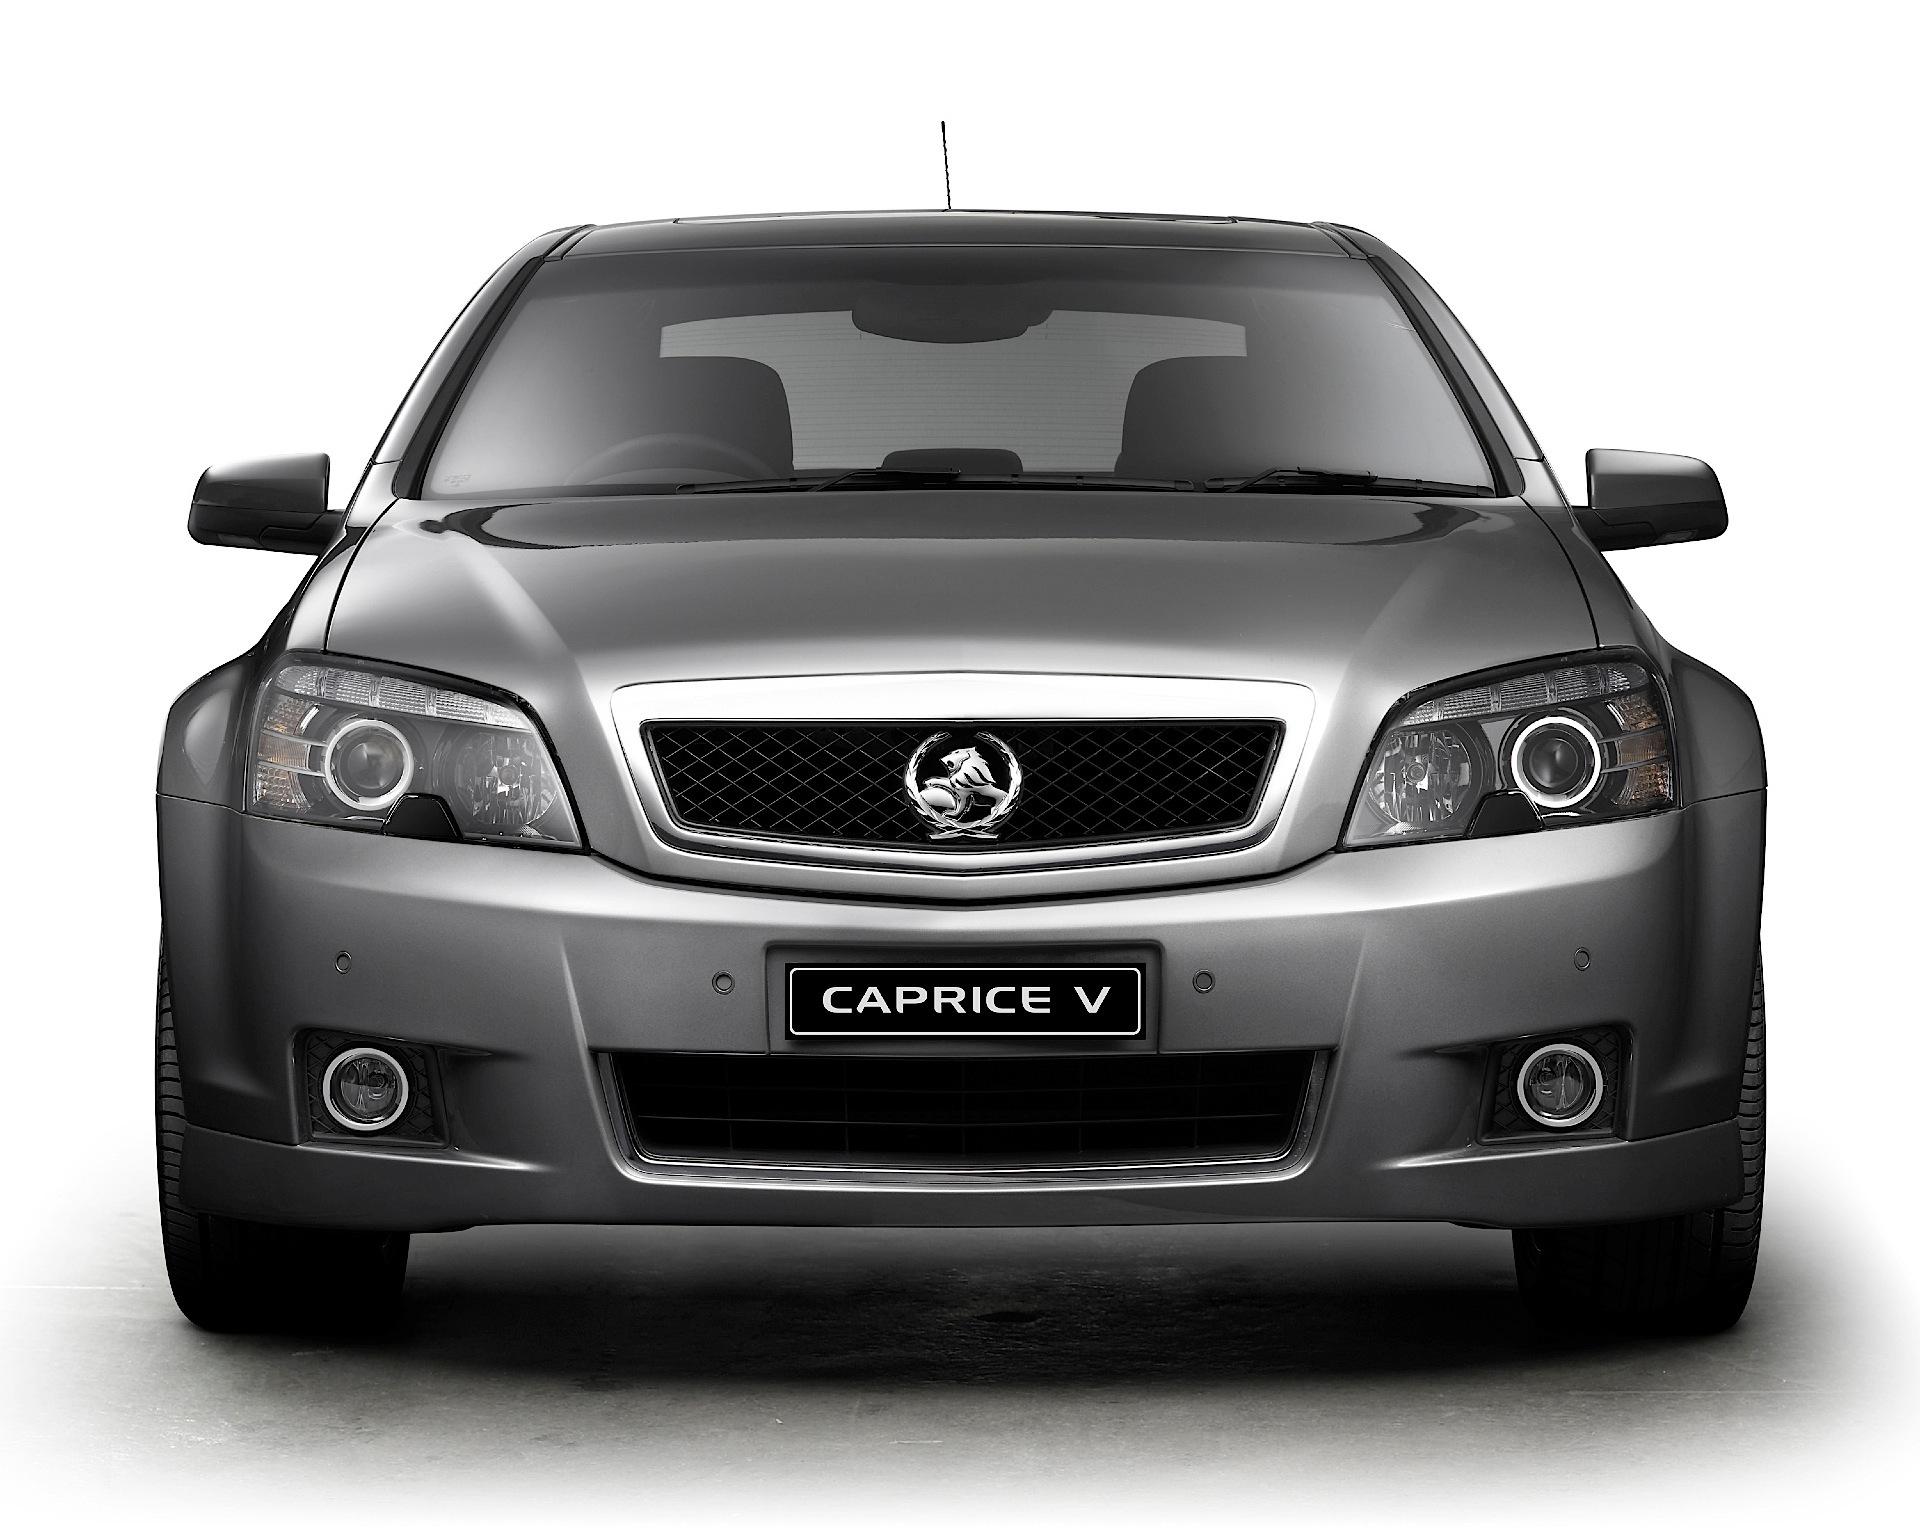 Holden Caprice 2010 2011 2012 2013 2014 2015 2016